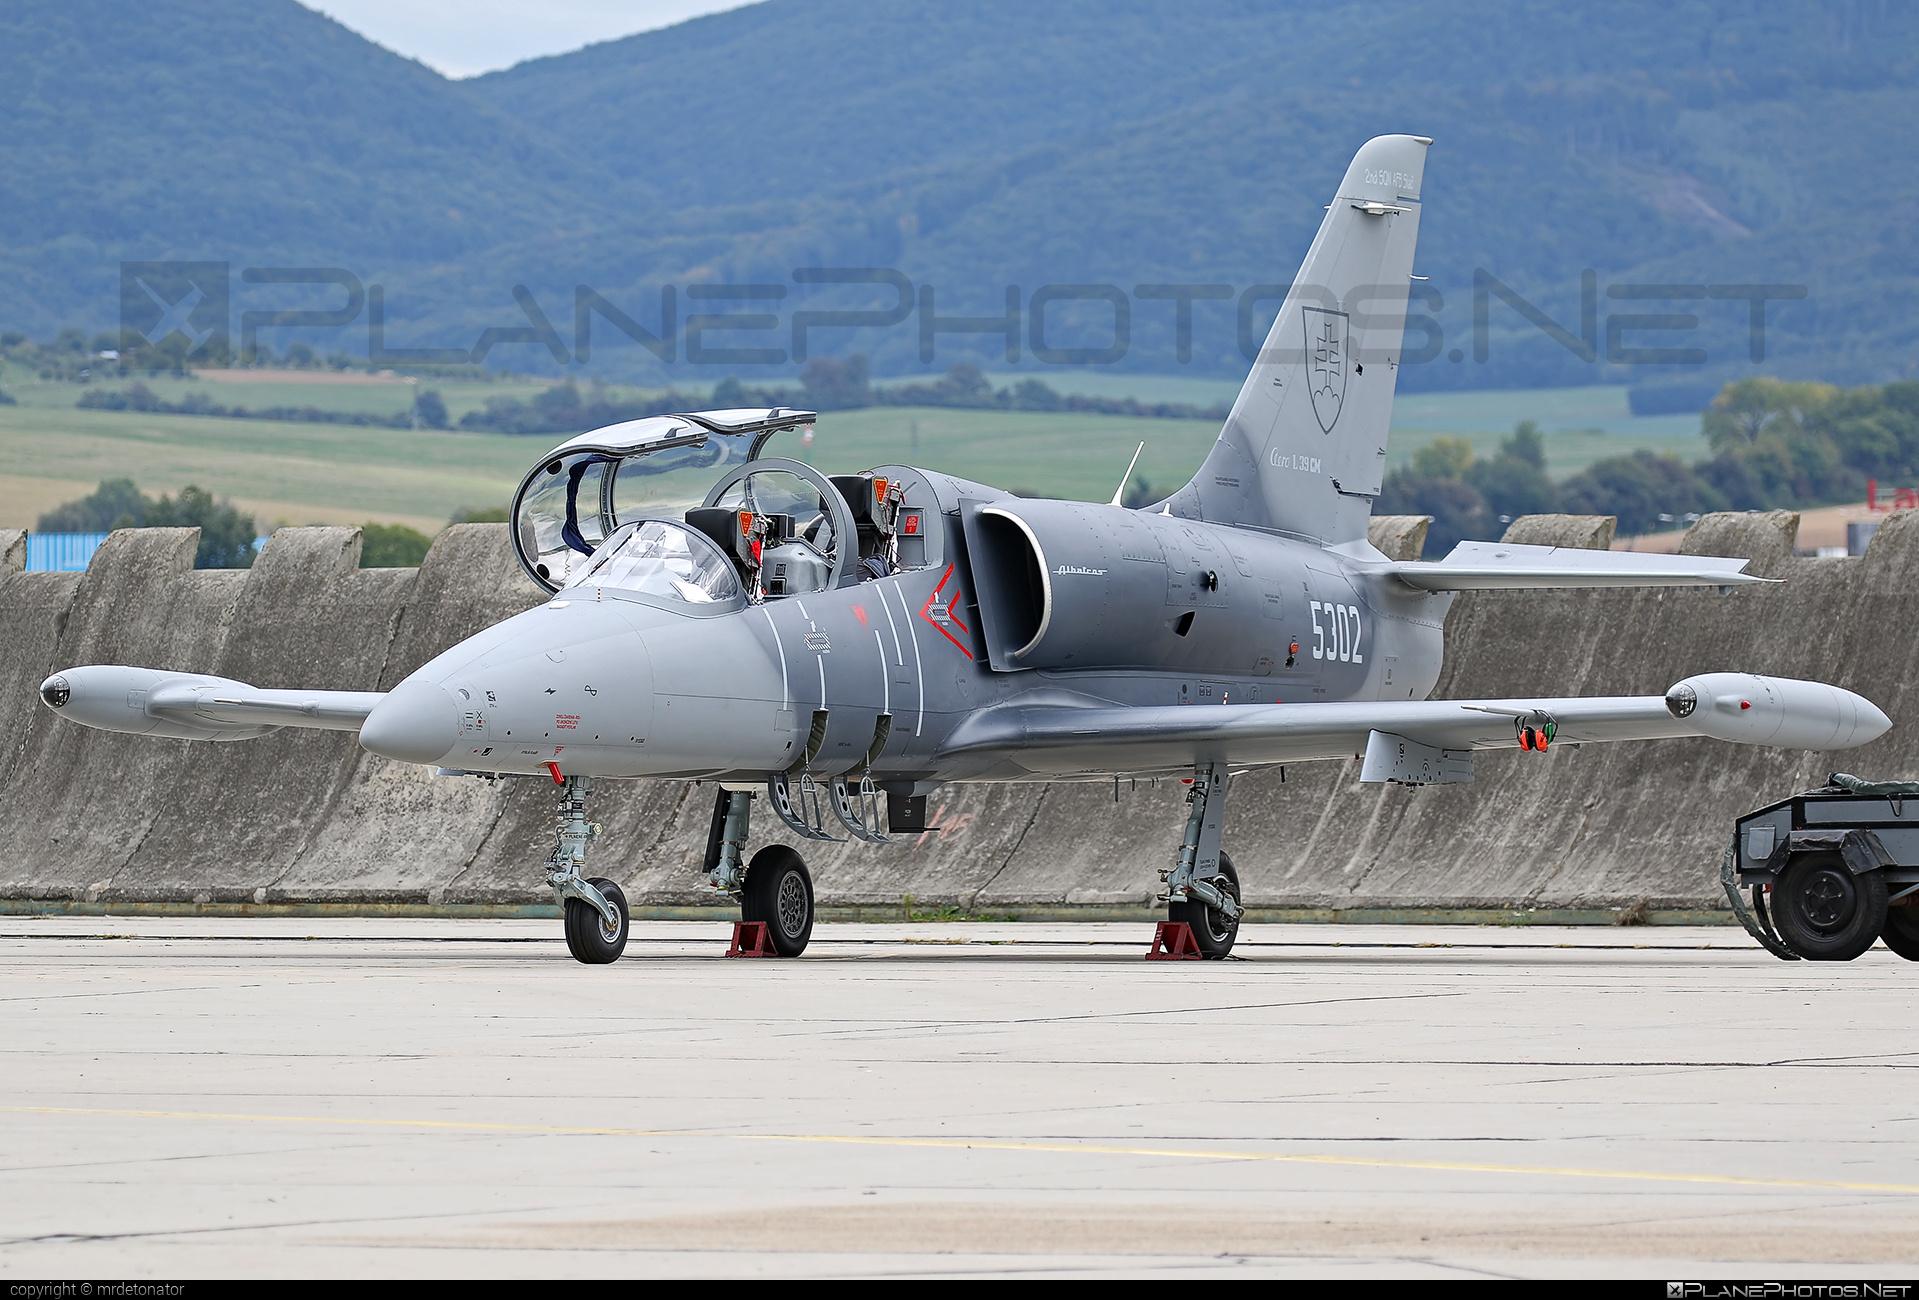 Aero L-39CM Albatros - 5302 operated by Vzdušné sily OS SR (Slovak Air Force) #aero #aerol39 #aerol39albatros #aerol39cmalbatros #albatros #l39 #l39cm #l39cmalbatros #slovakairforce #vzdusnesilyossr